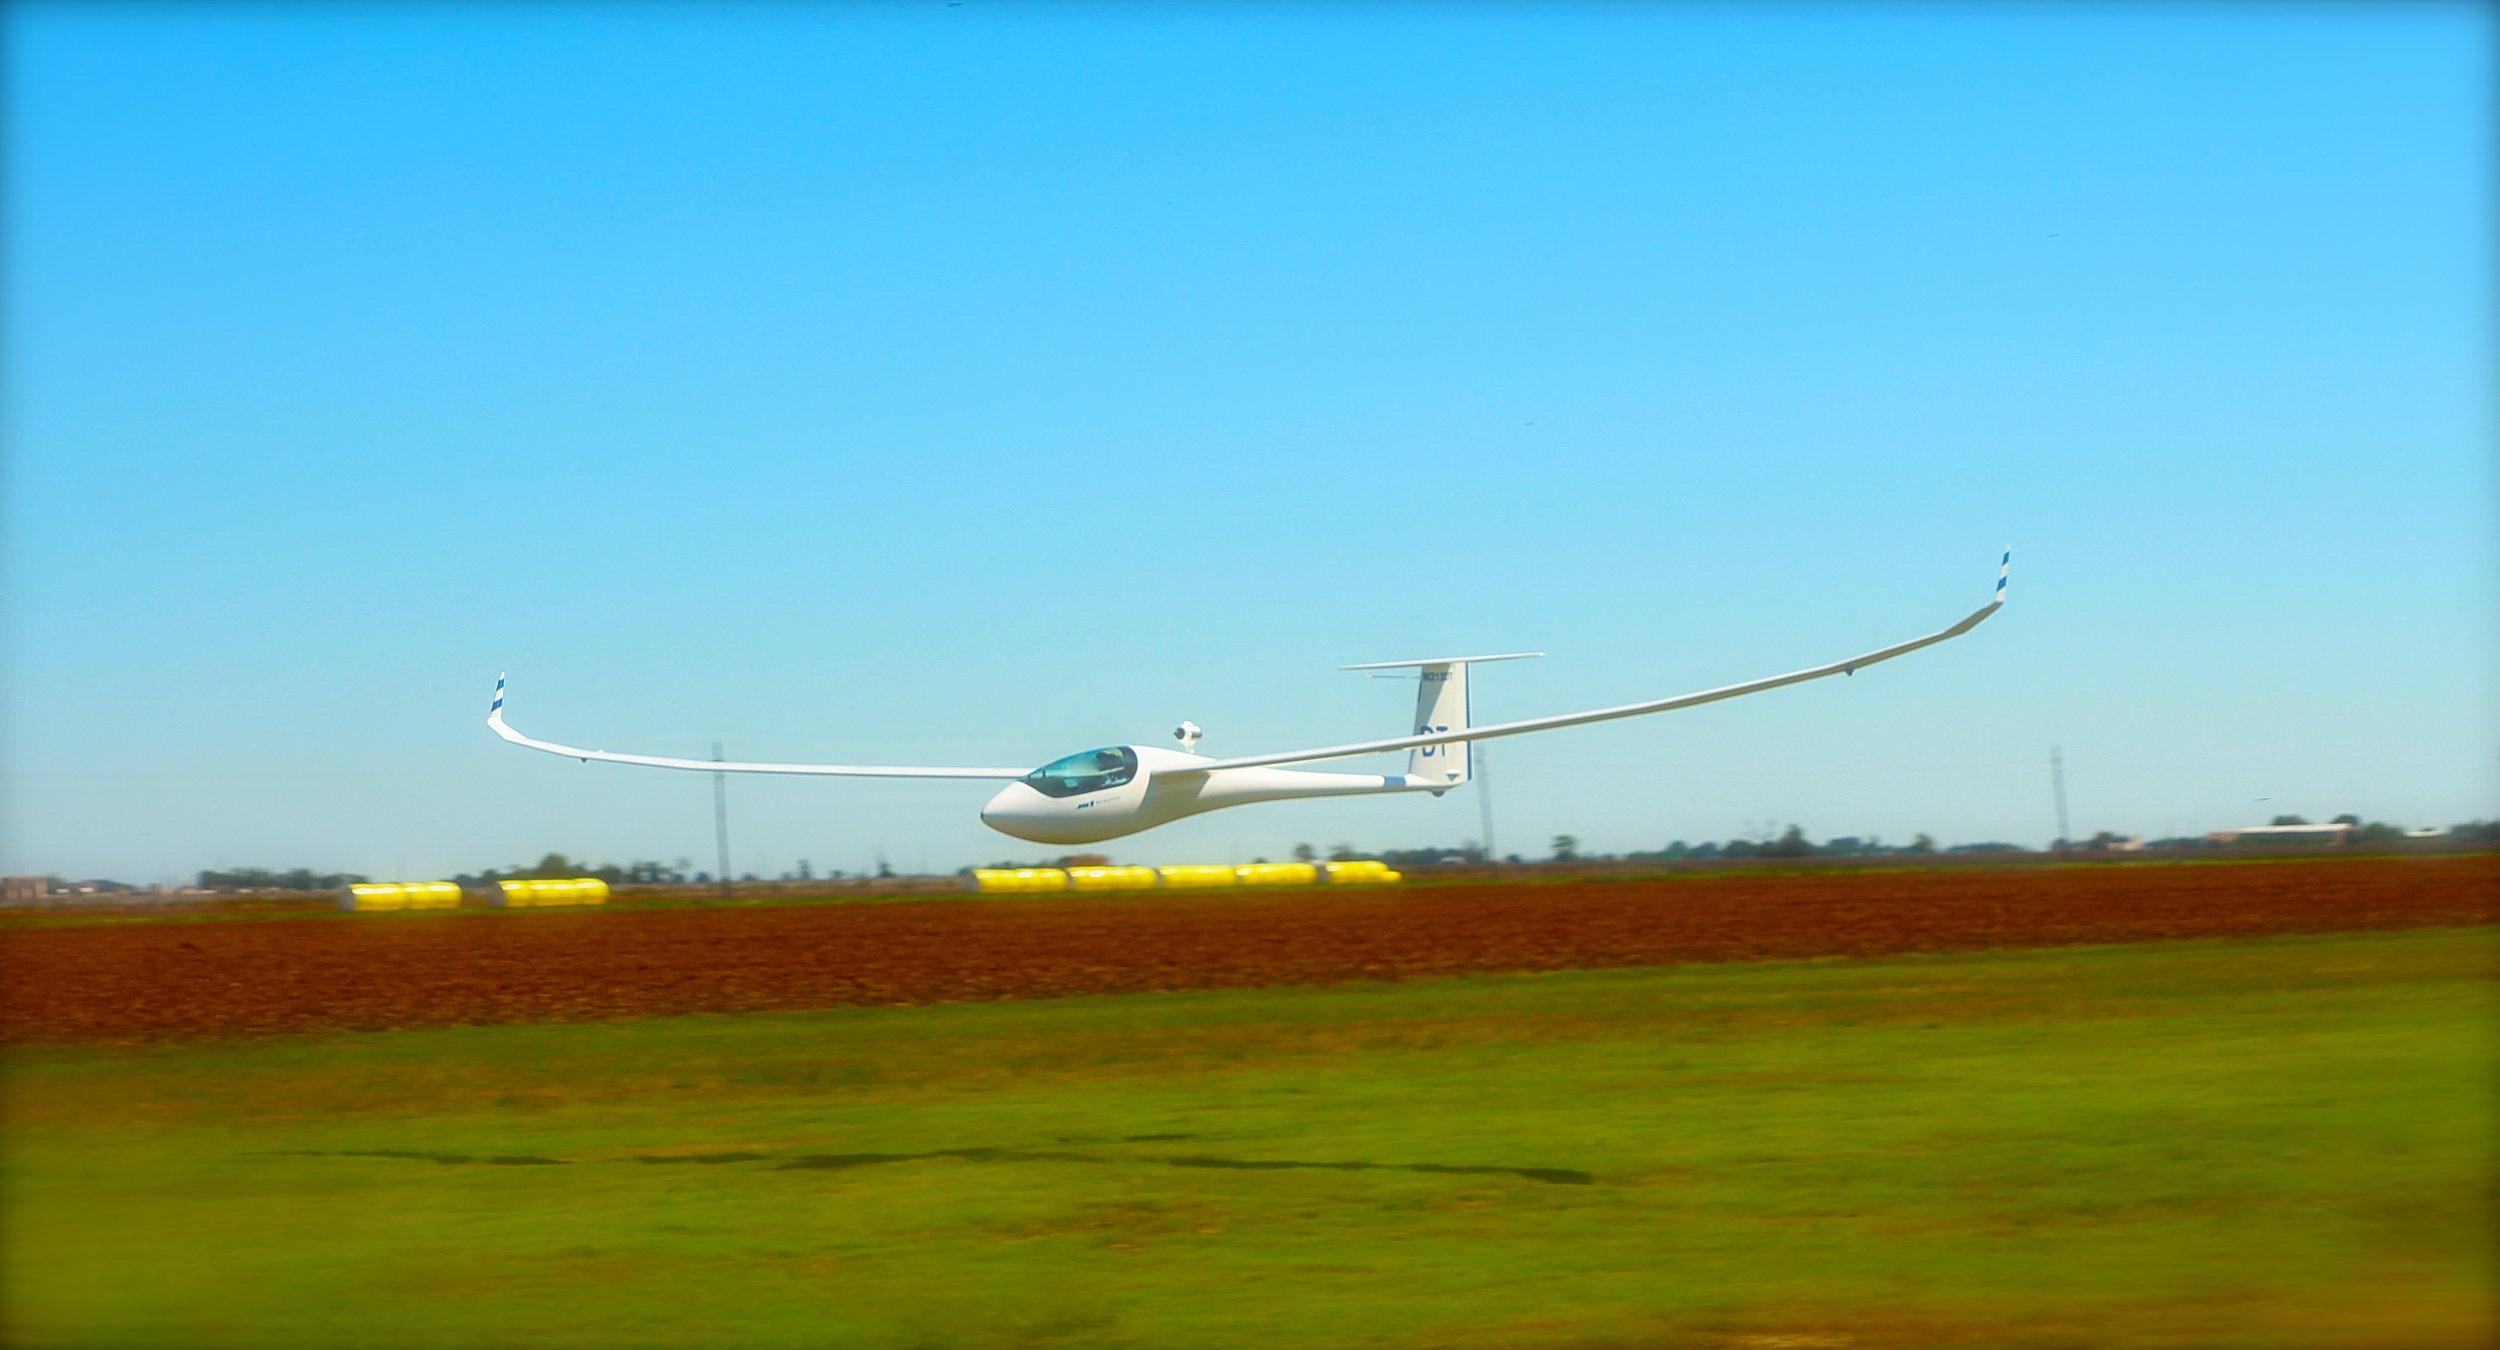 David pilots his JS1 glider.